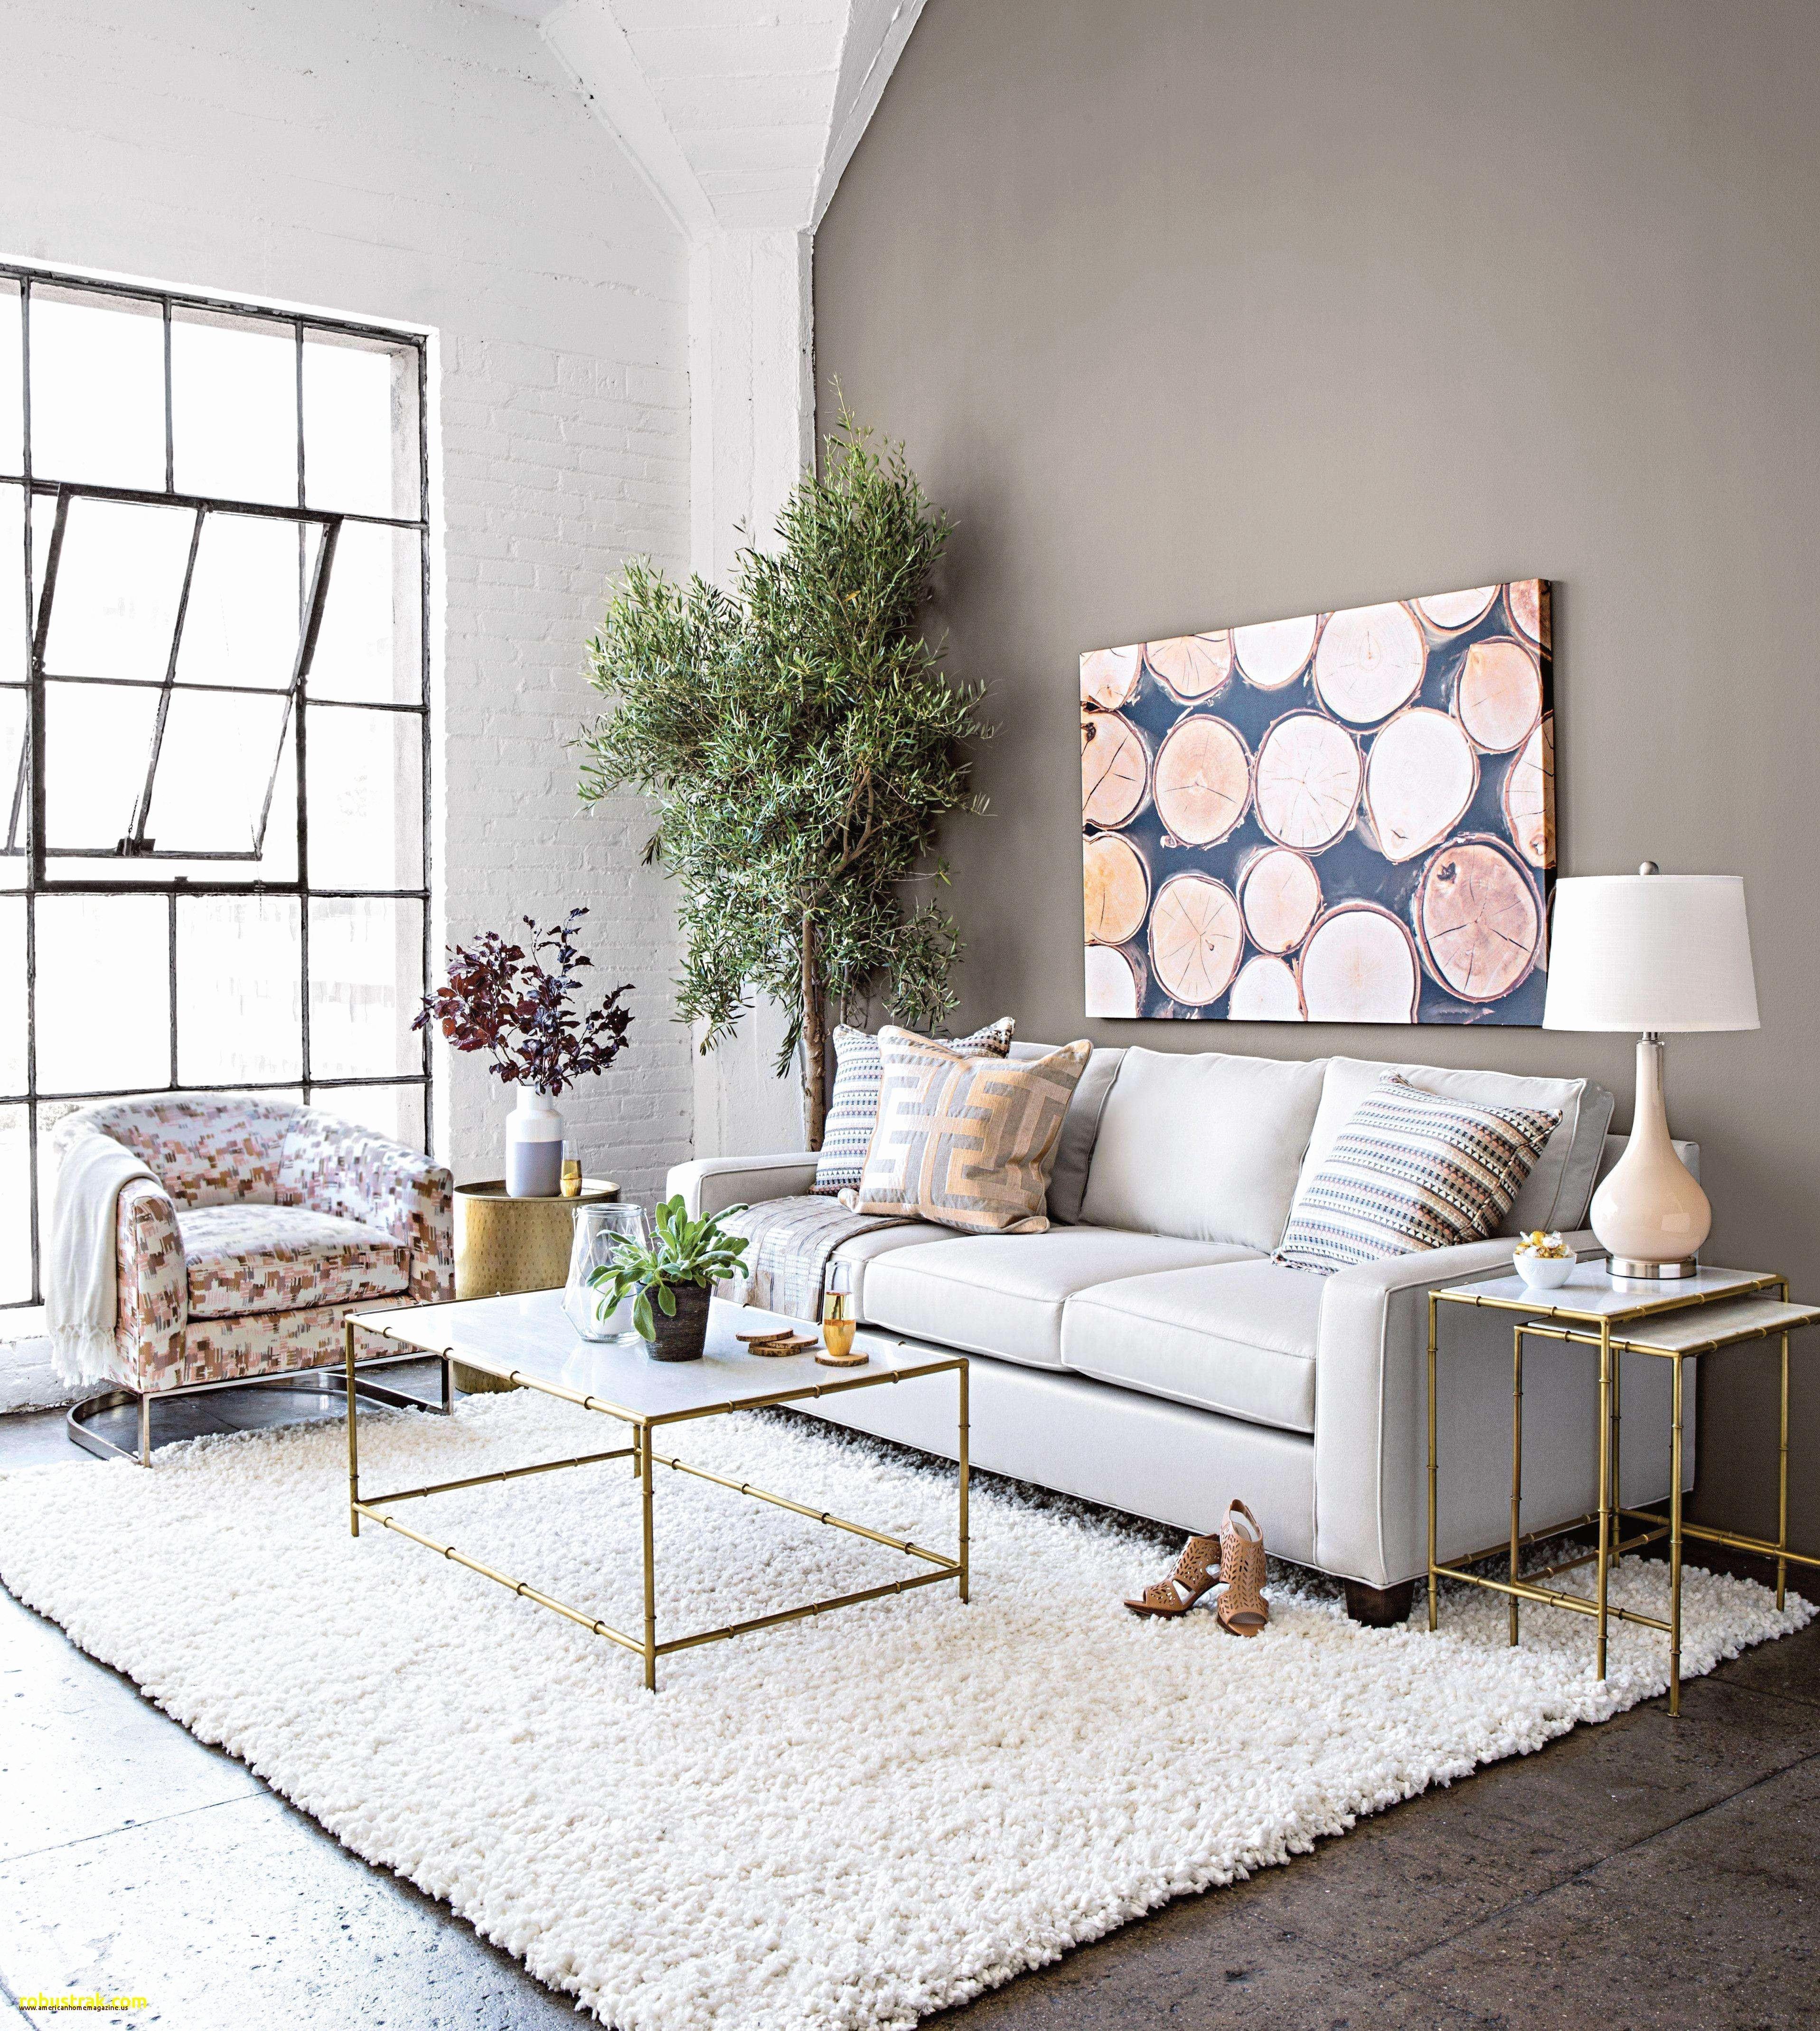 large floor vase arrangements of download elegant large modern living room ideas pertaining to large modern living room ideas new metal wall art panels fresh 1 kirkland wall decor home